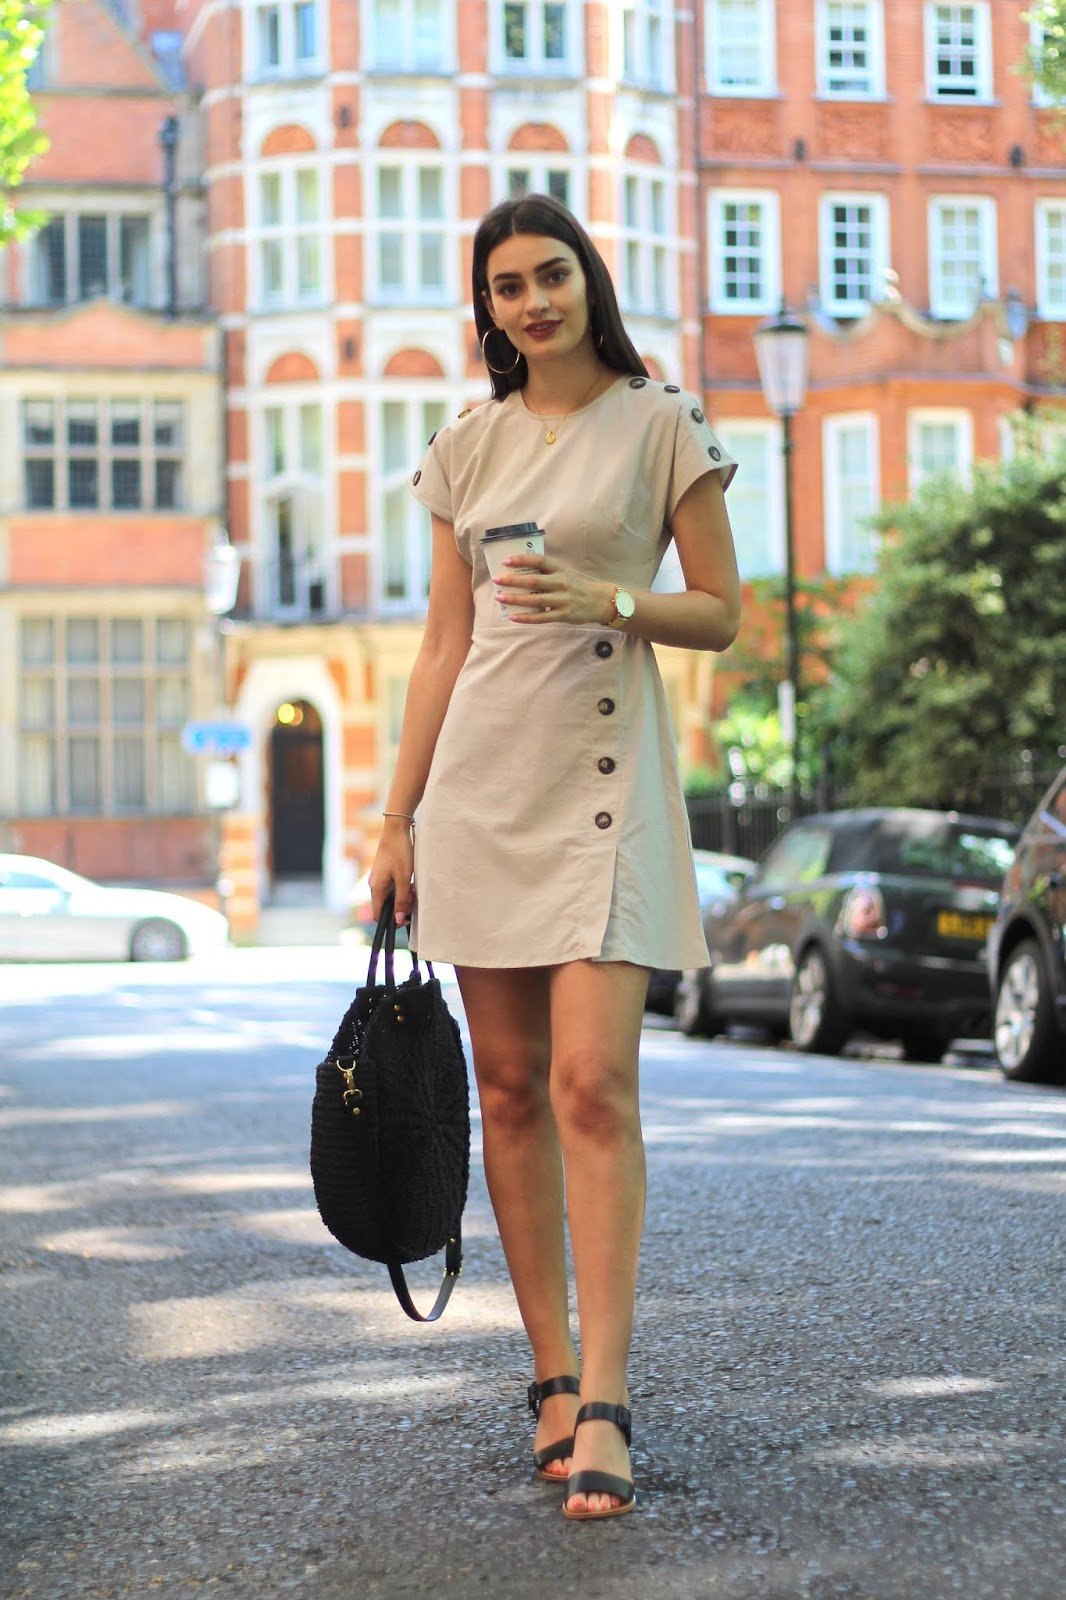 instagram tips peexo fashion blog